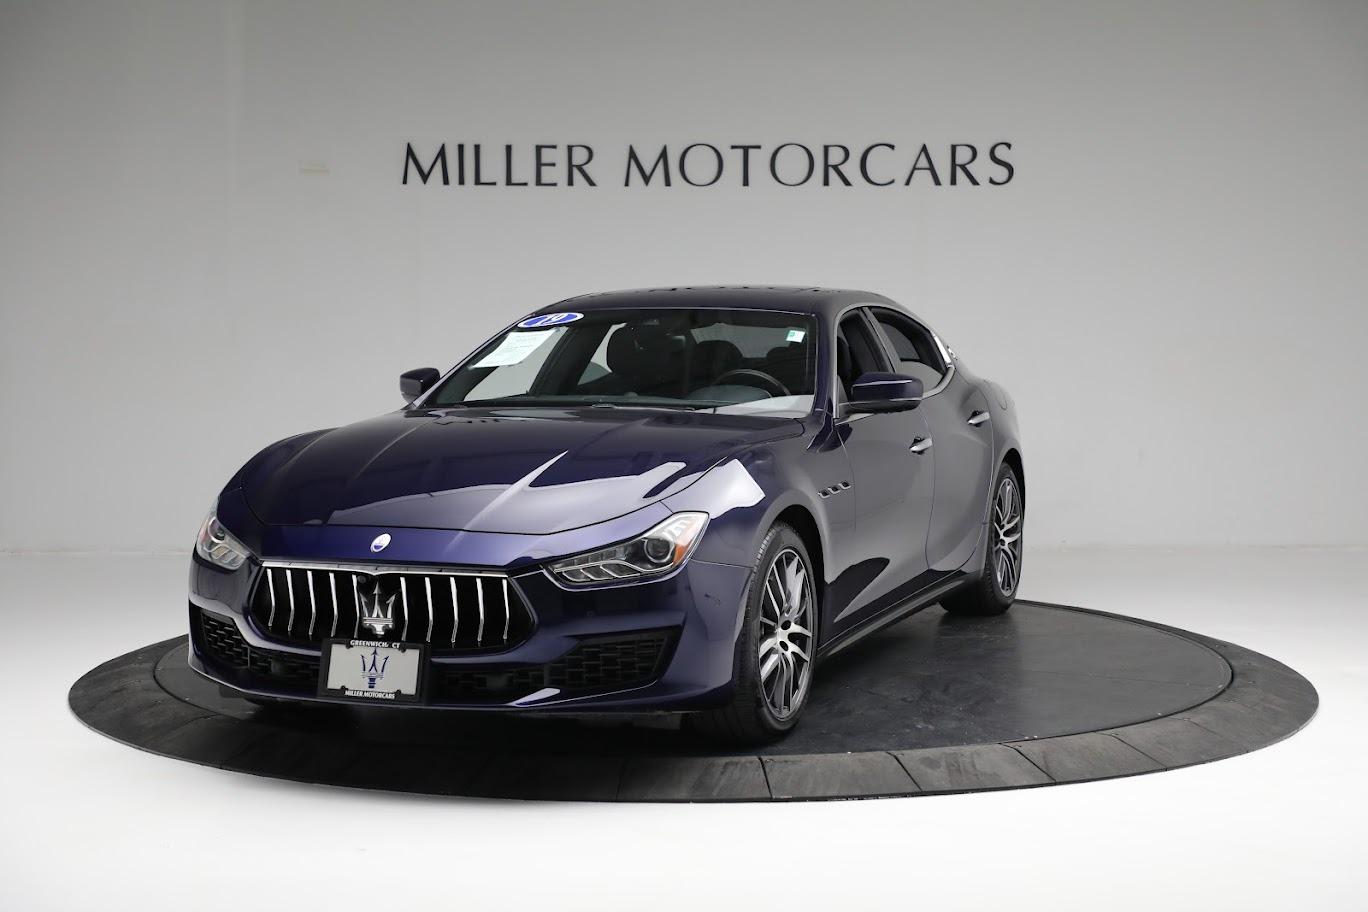 New 2019 Maserati Ghibli S Q4 for sale $90,765 at Maserati of Greenwich in Greenwich CT 06830 1